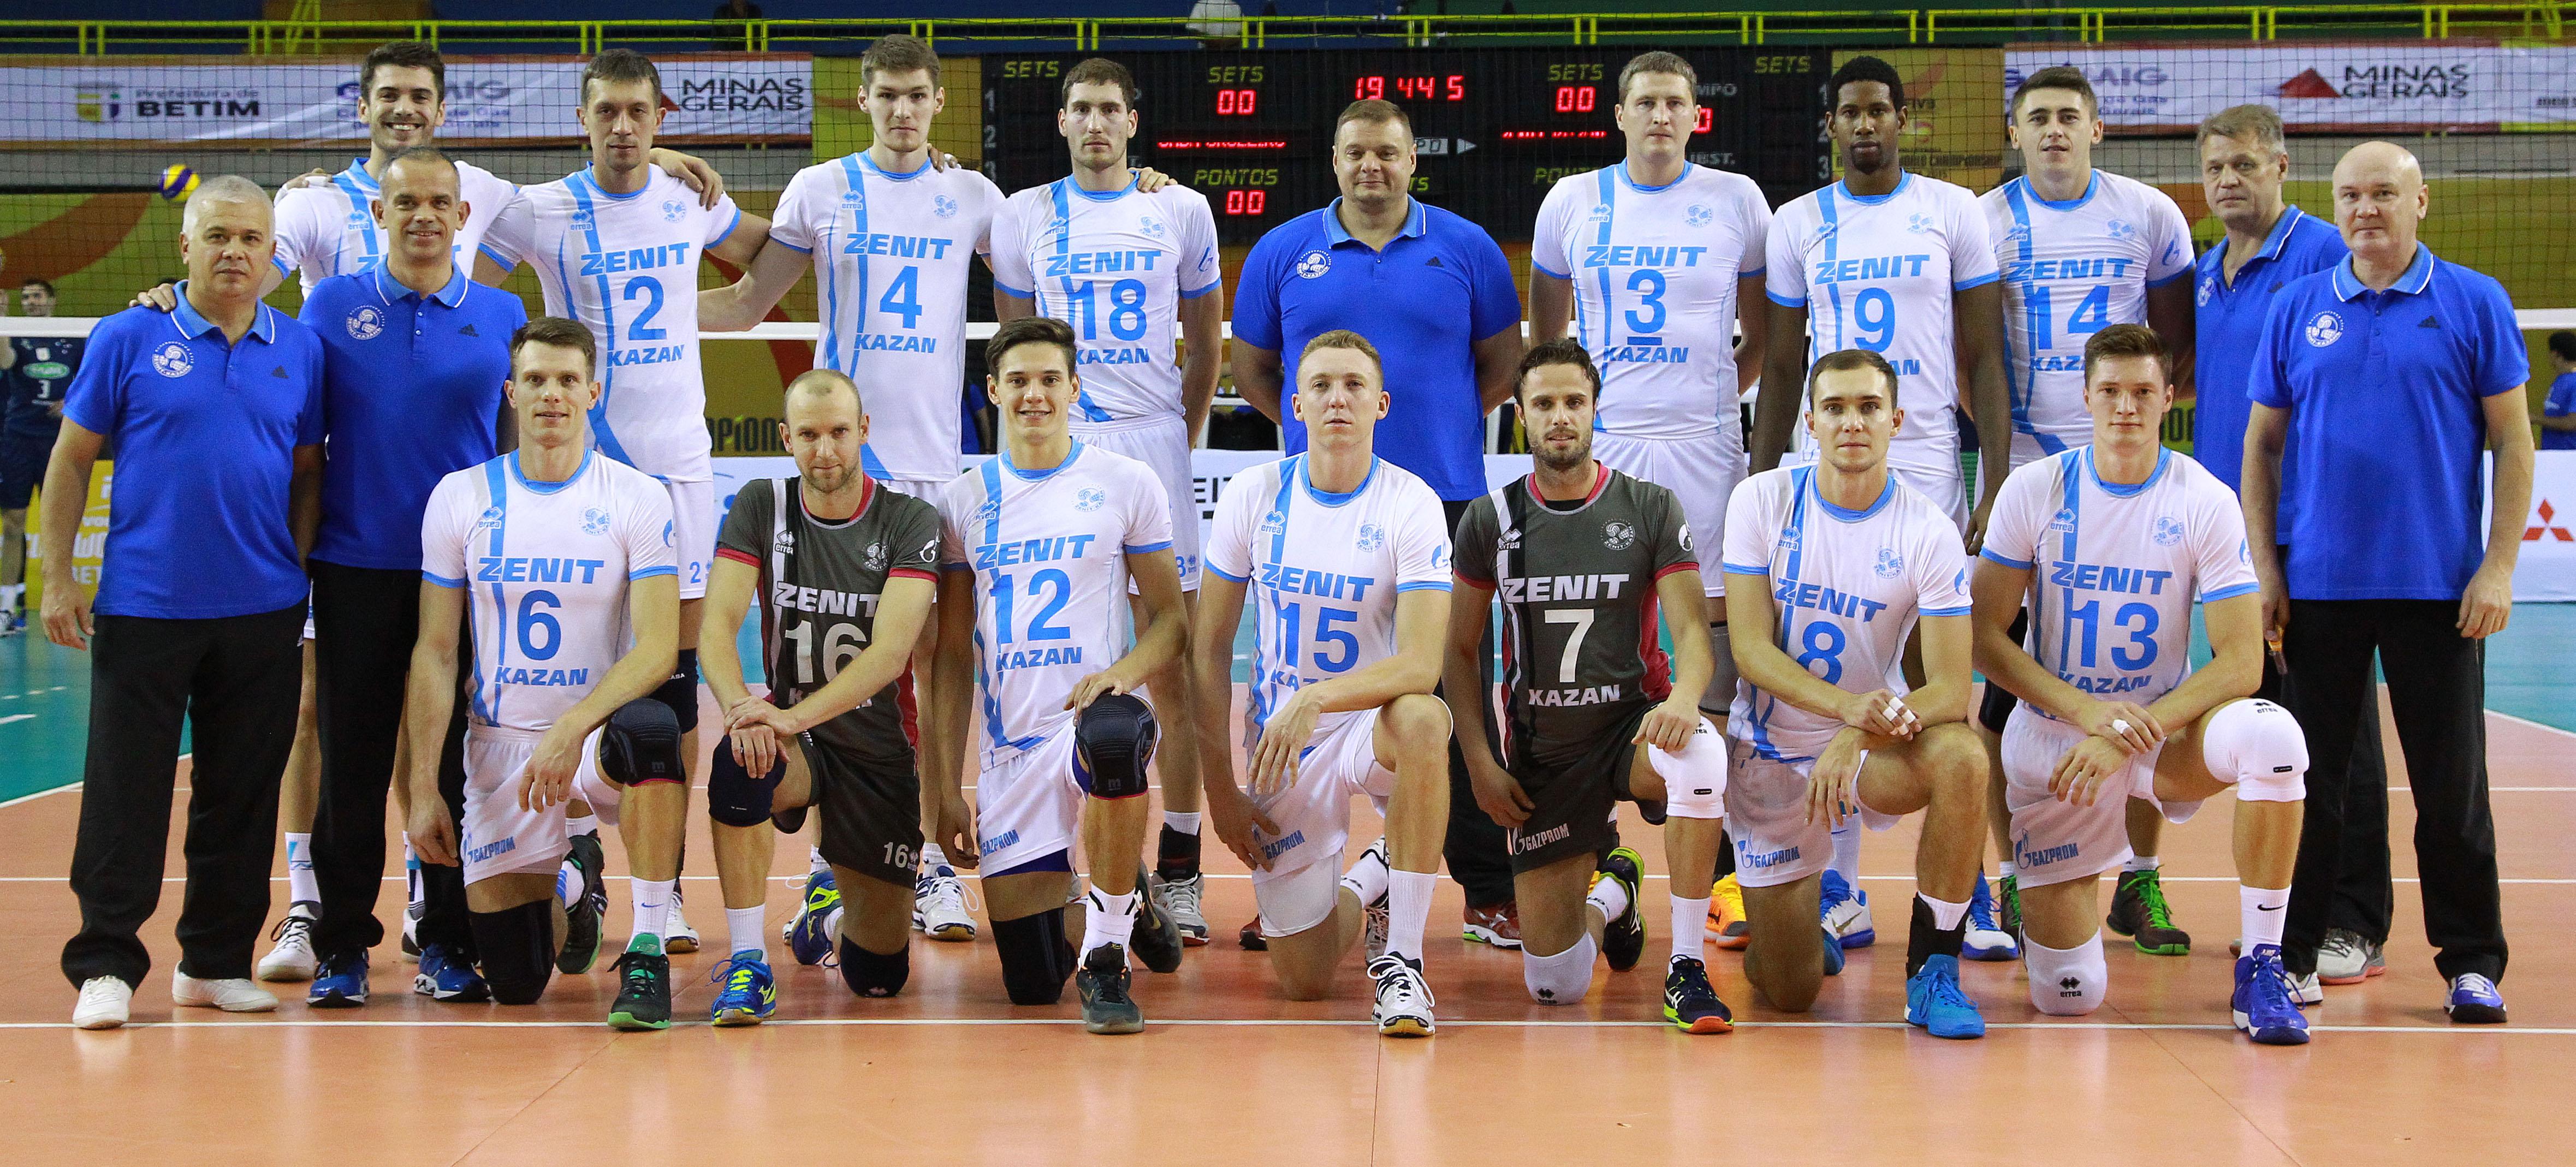 Post Match Sada Cruzeiro Volei Zenit Kazan Fivb Volleyball Men S Club World Championship 2015